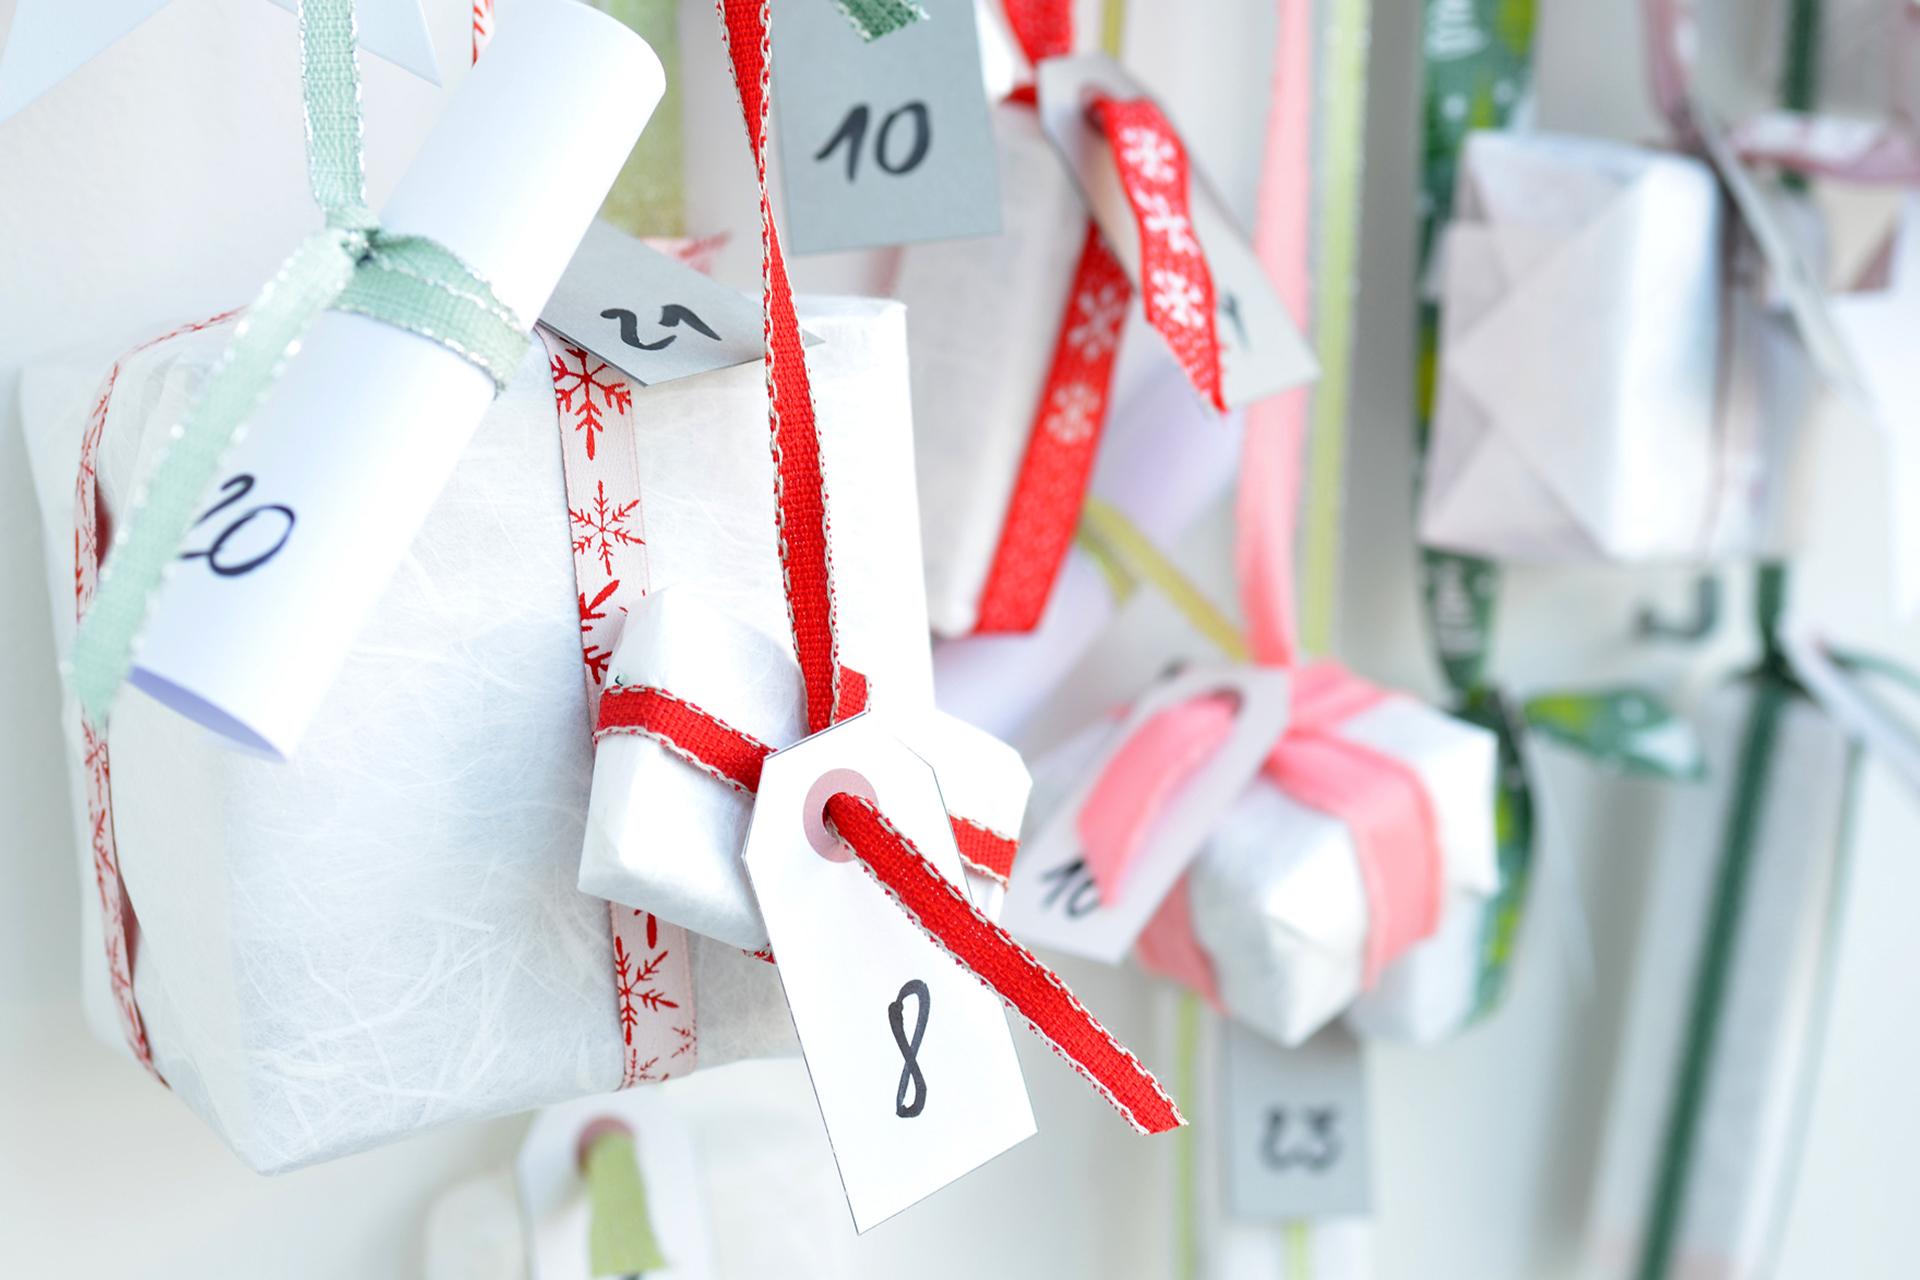 Adventskalender am Kleiderbügel